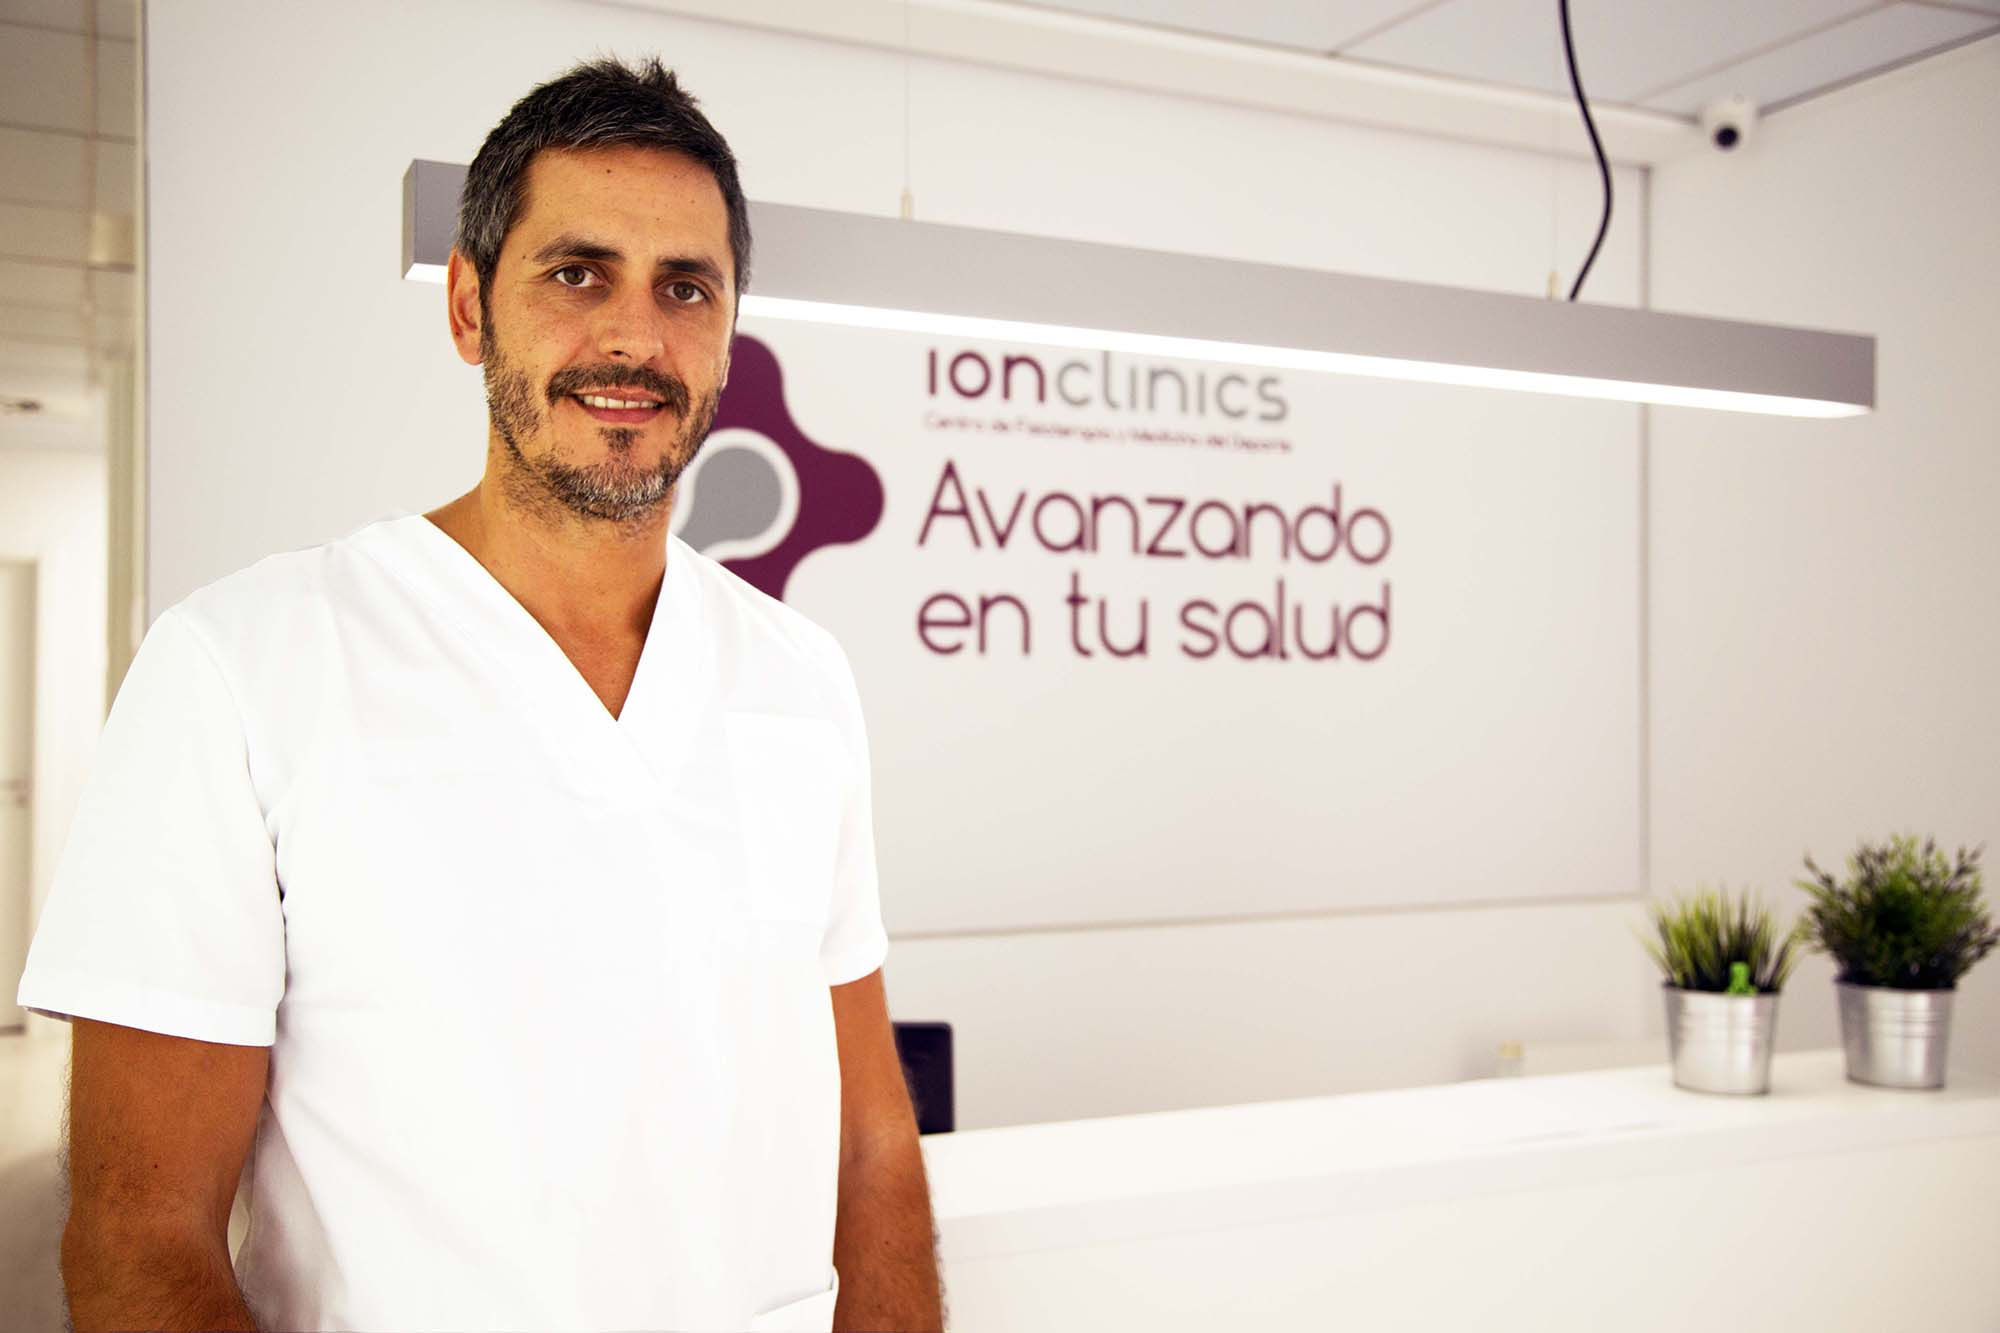 Javier Herraiz Garvin fisioterapeuta IONCLINICS